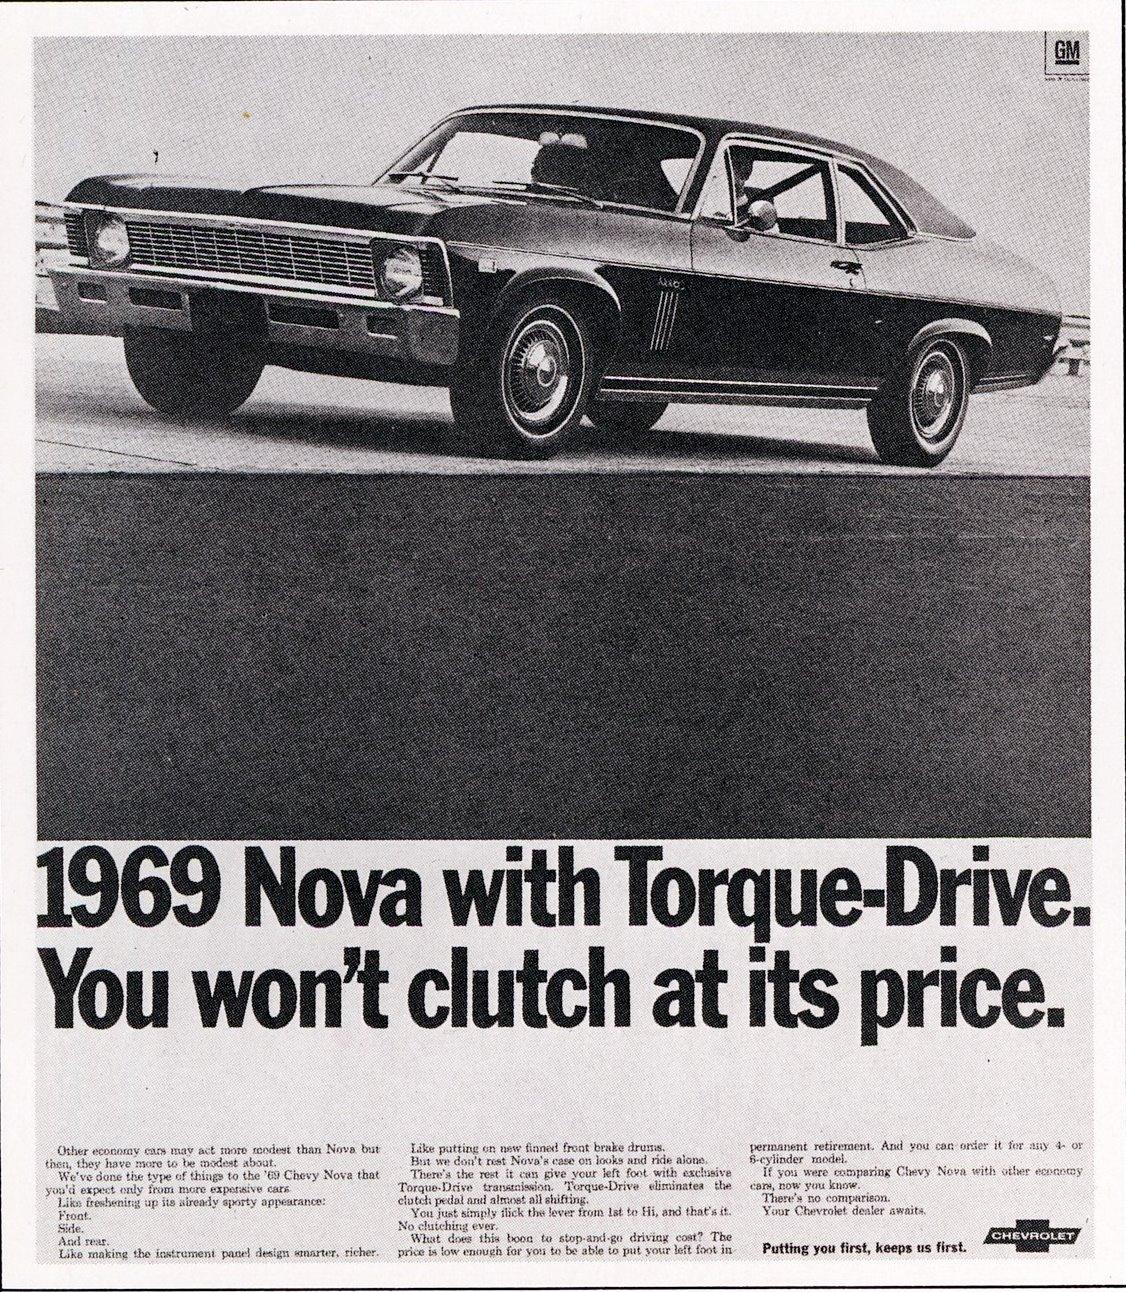 ['69+Nova-won't+clutch+NP]